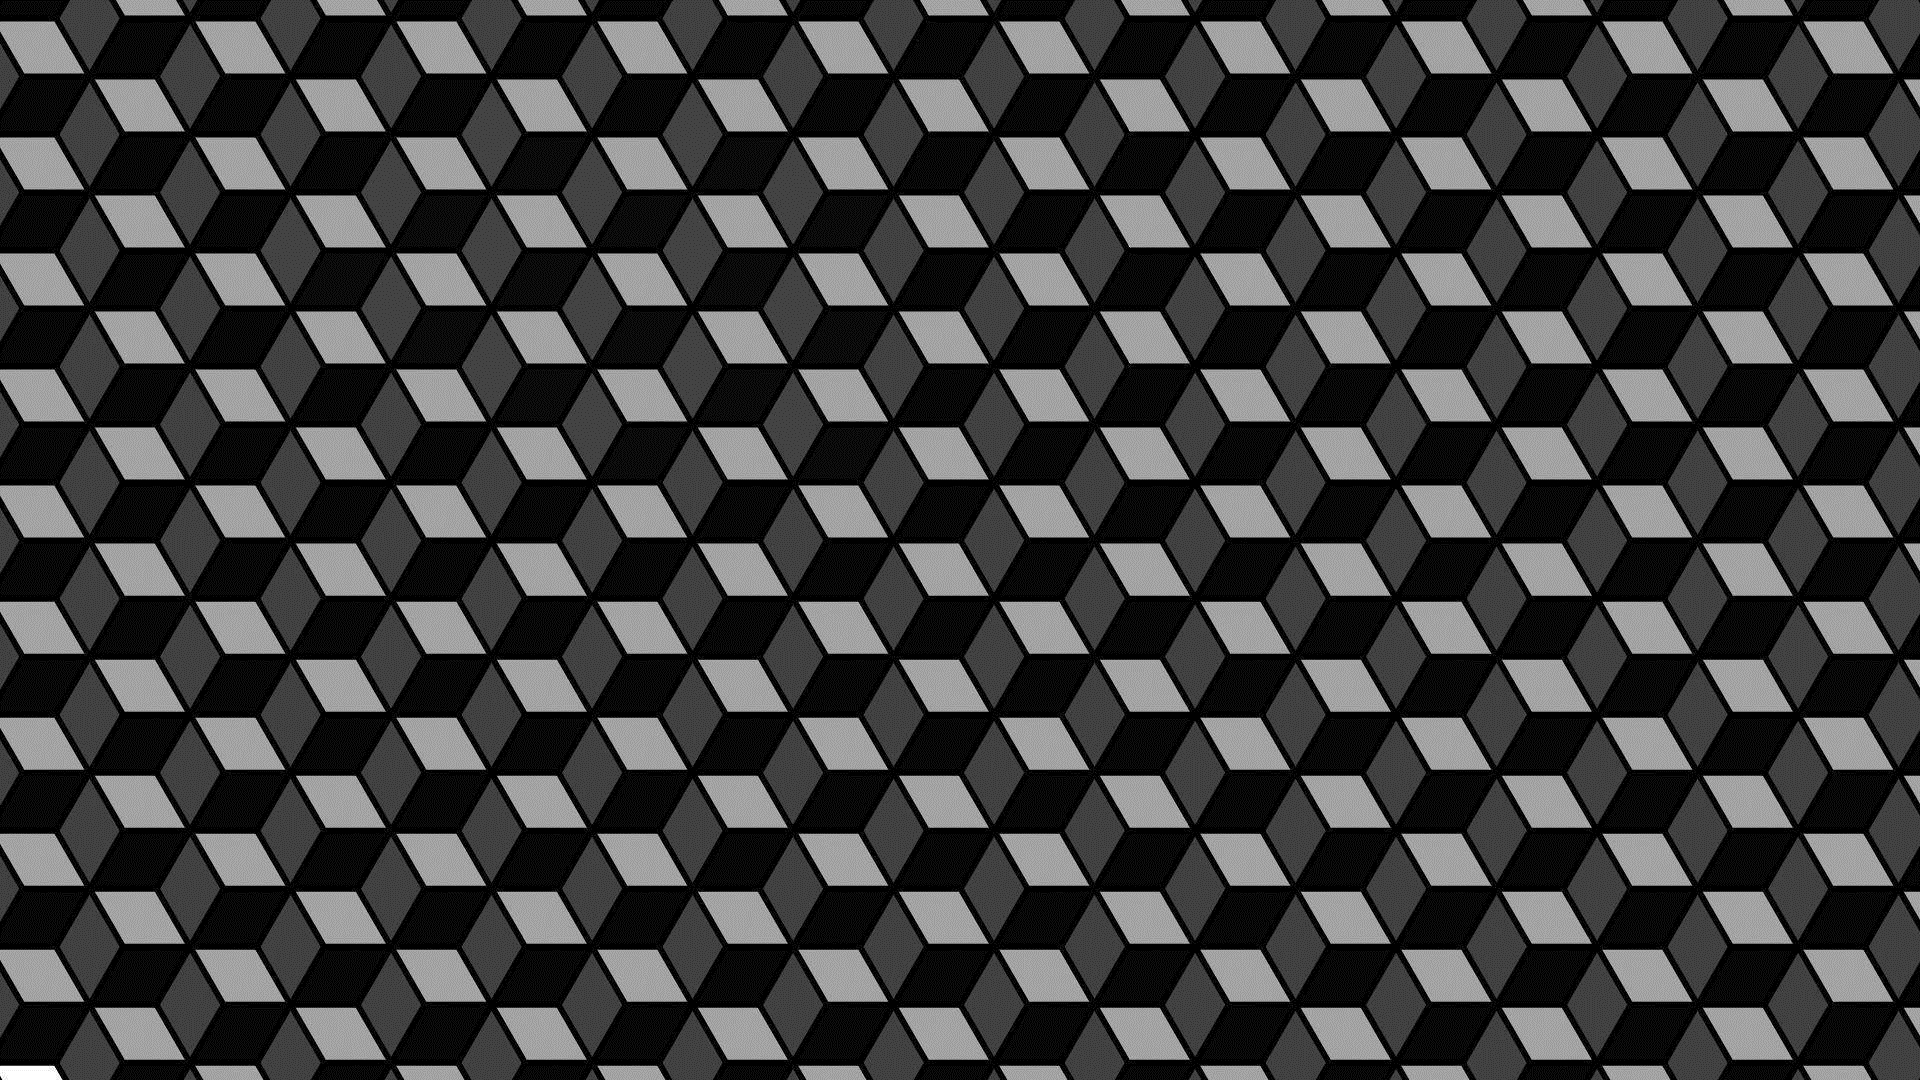 Illusion Picture